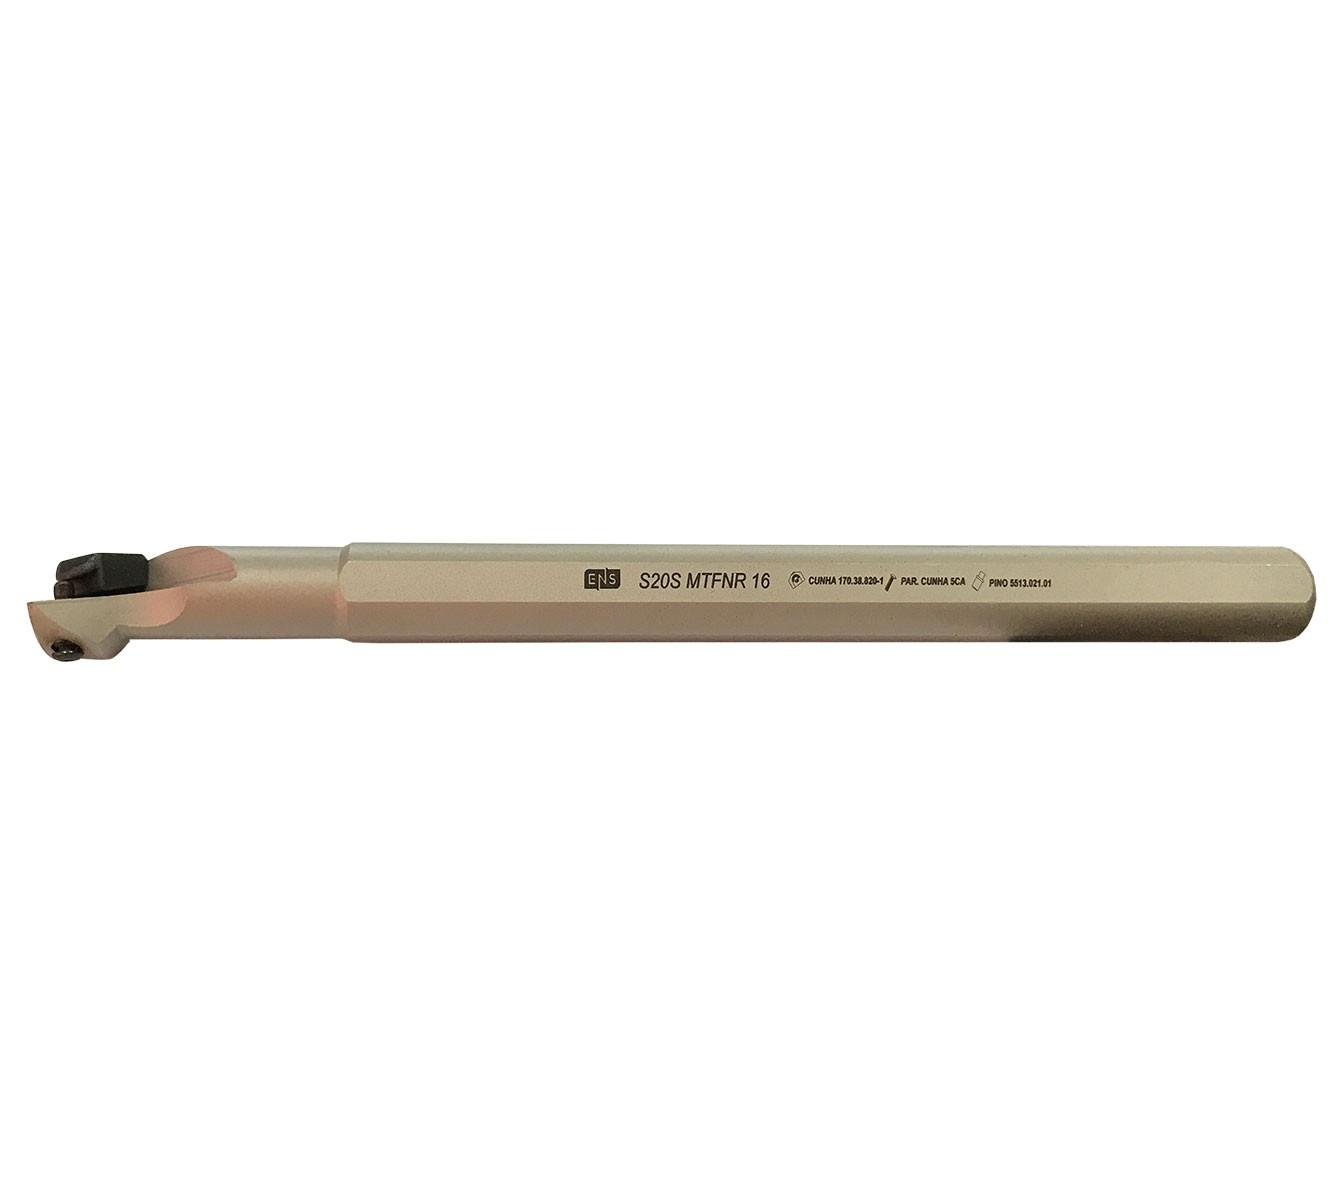 Suporte Para Torno Int. 20mm Direito Tnmg 16 - S20s Mtfnr 16